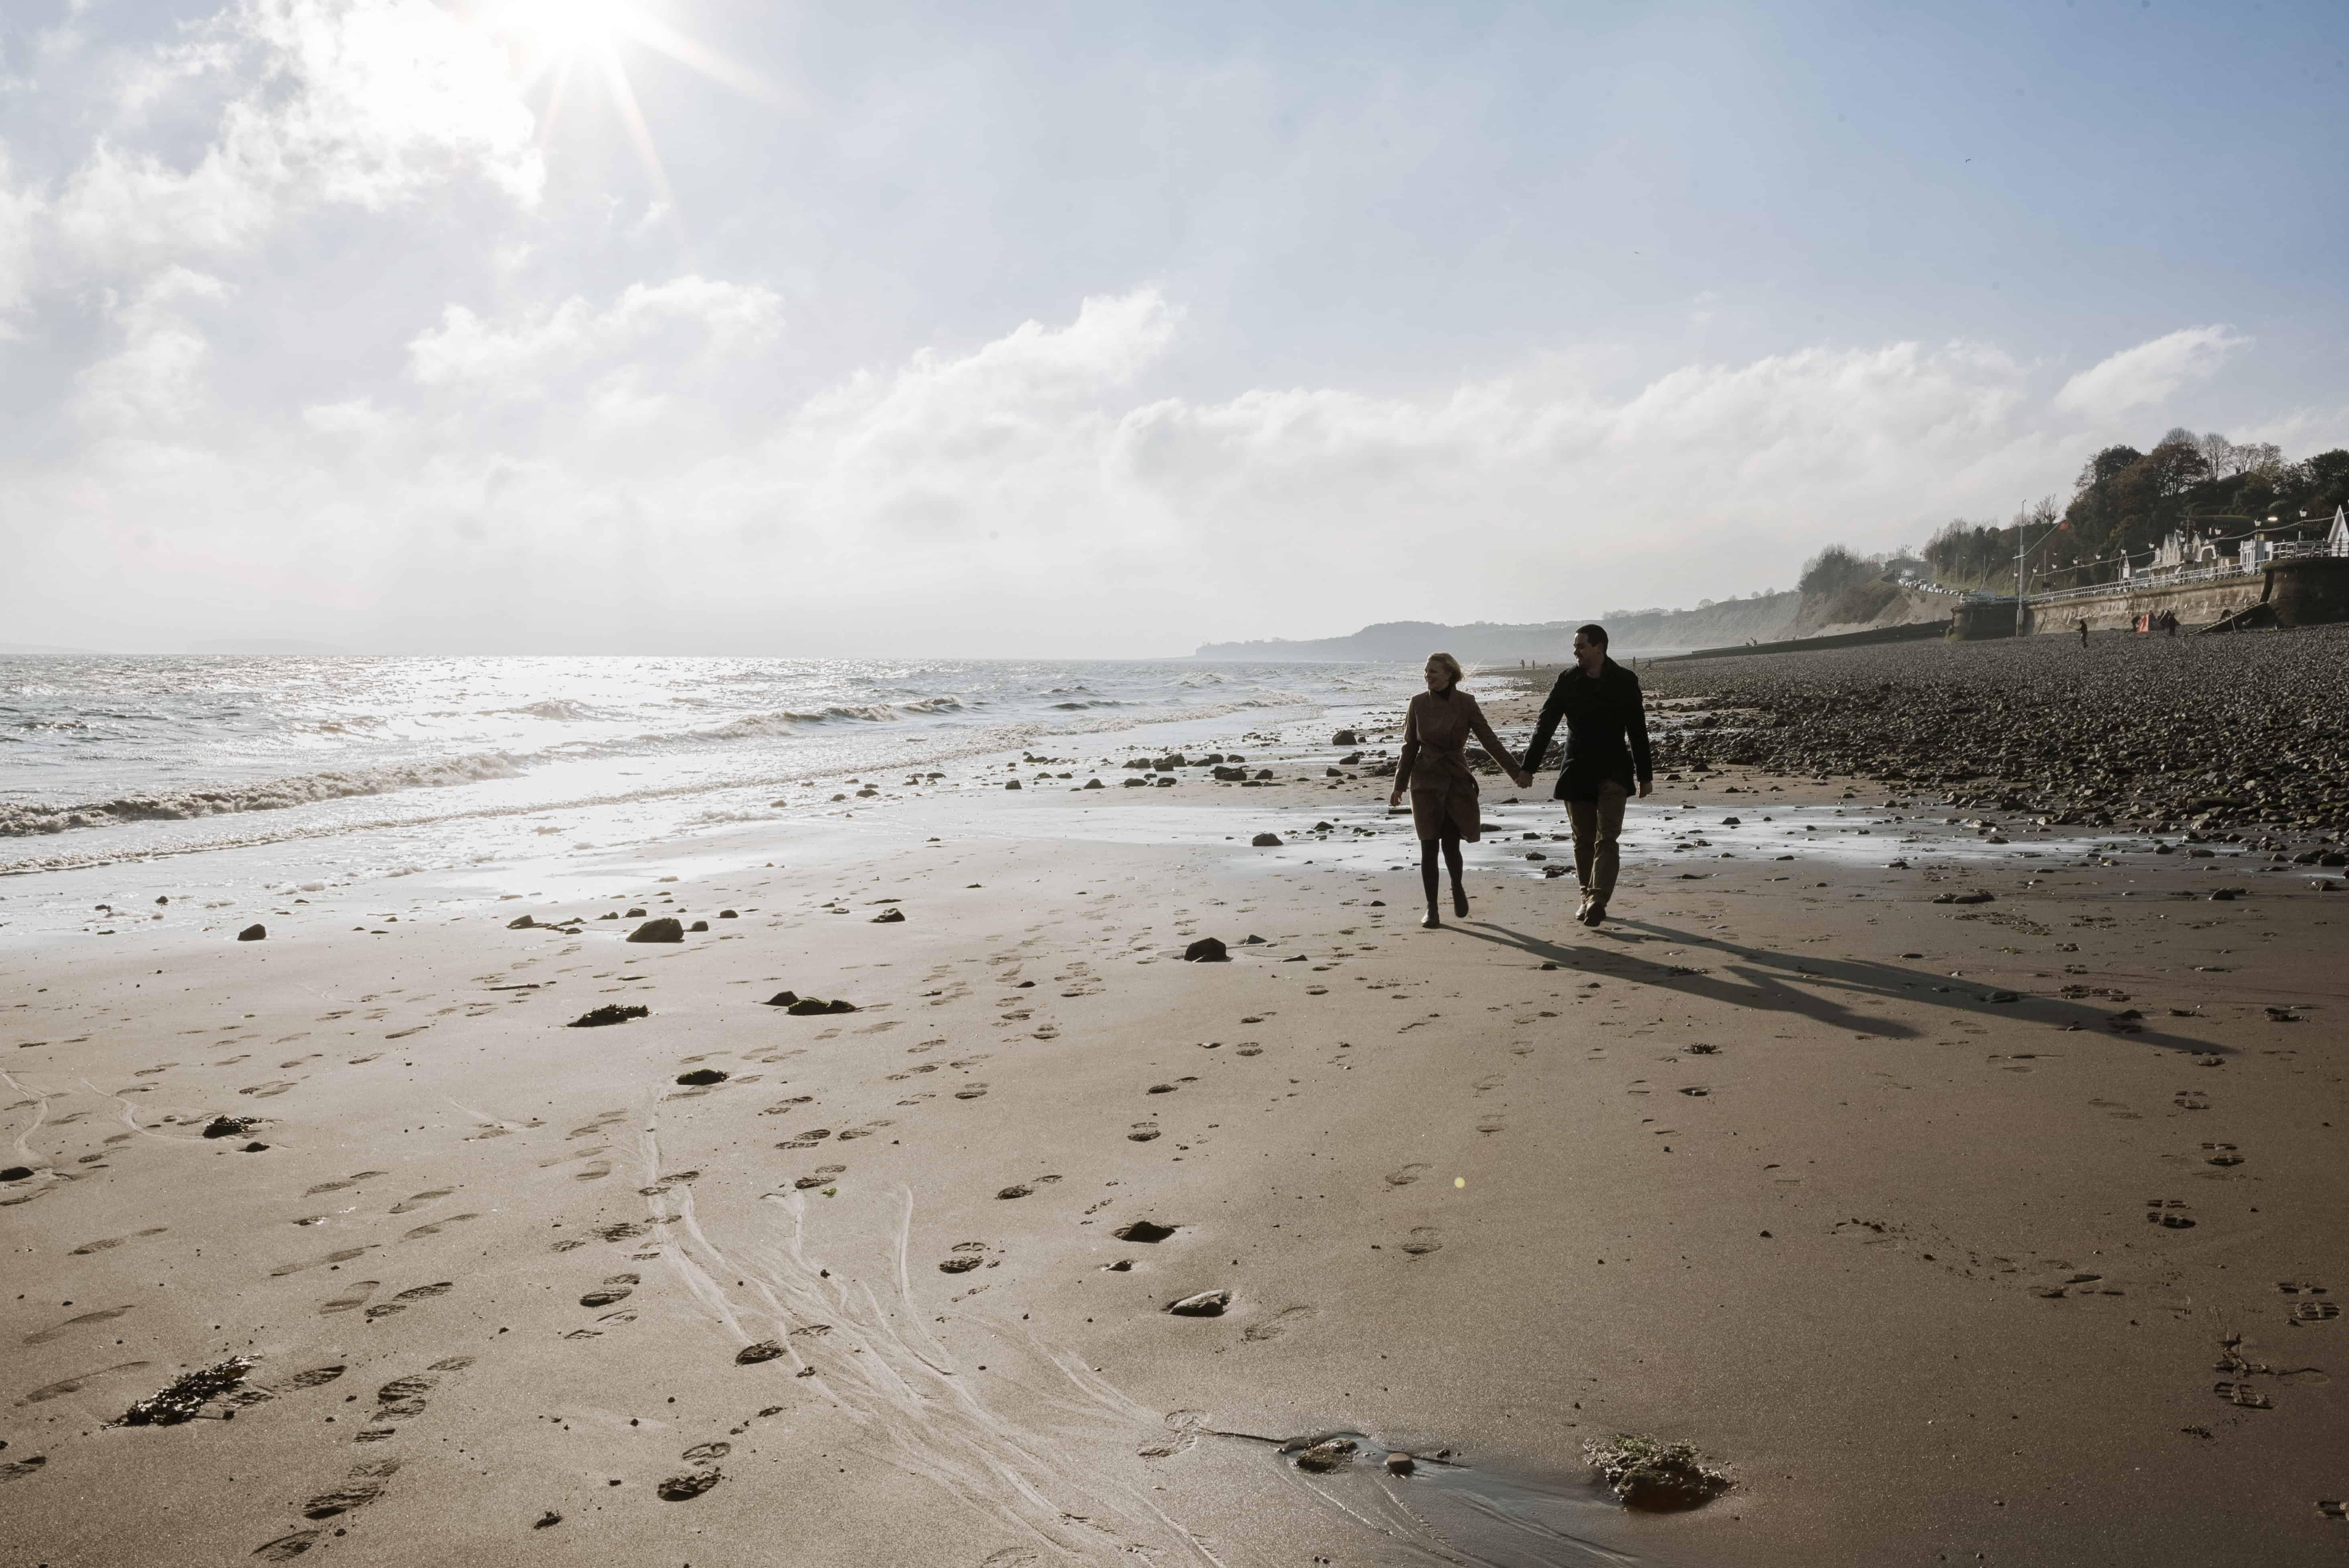 Couple walking sandy beach